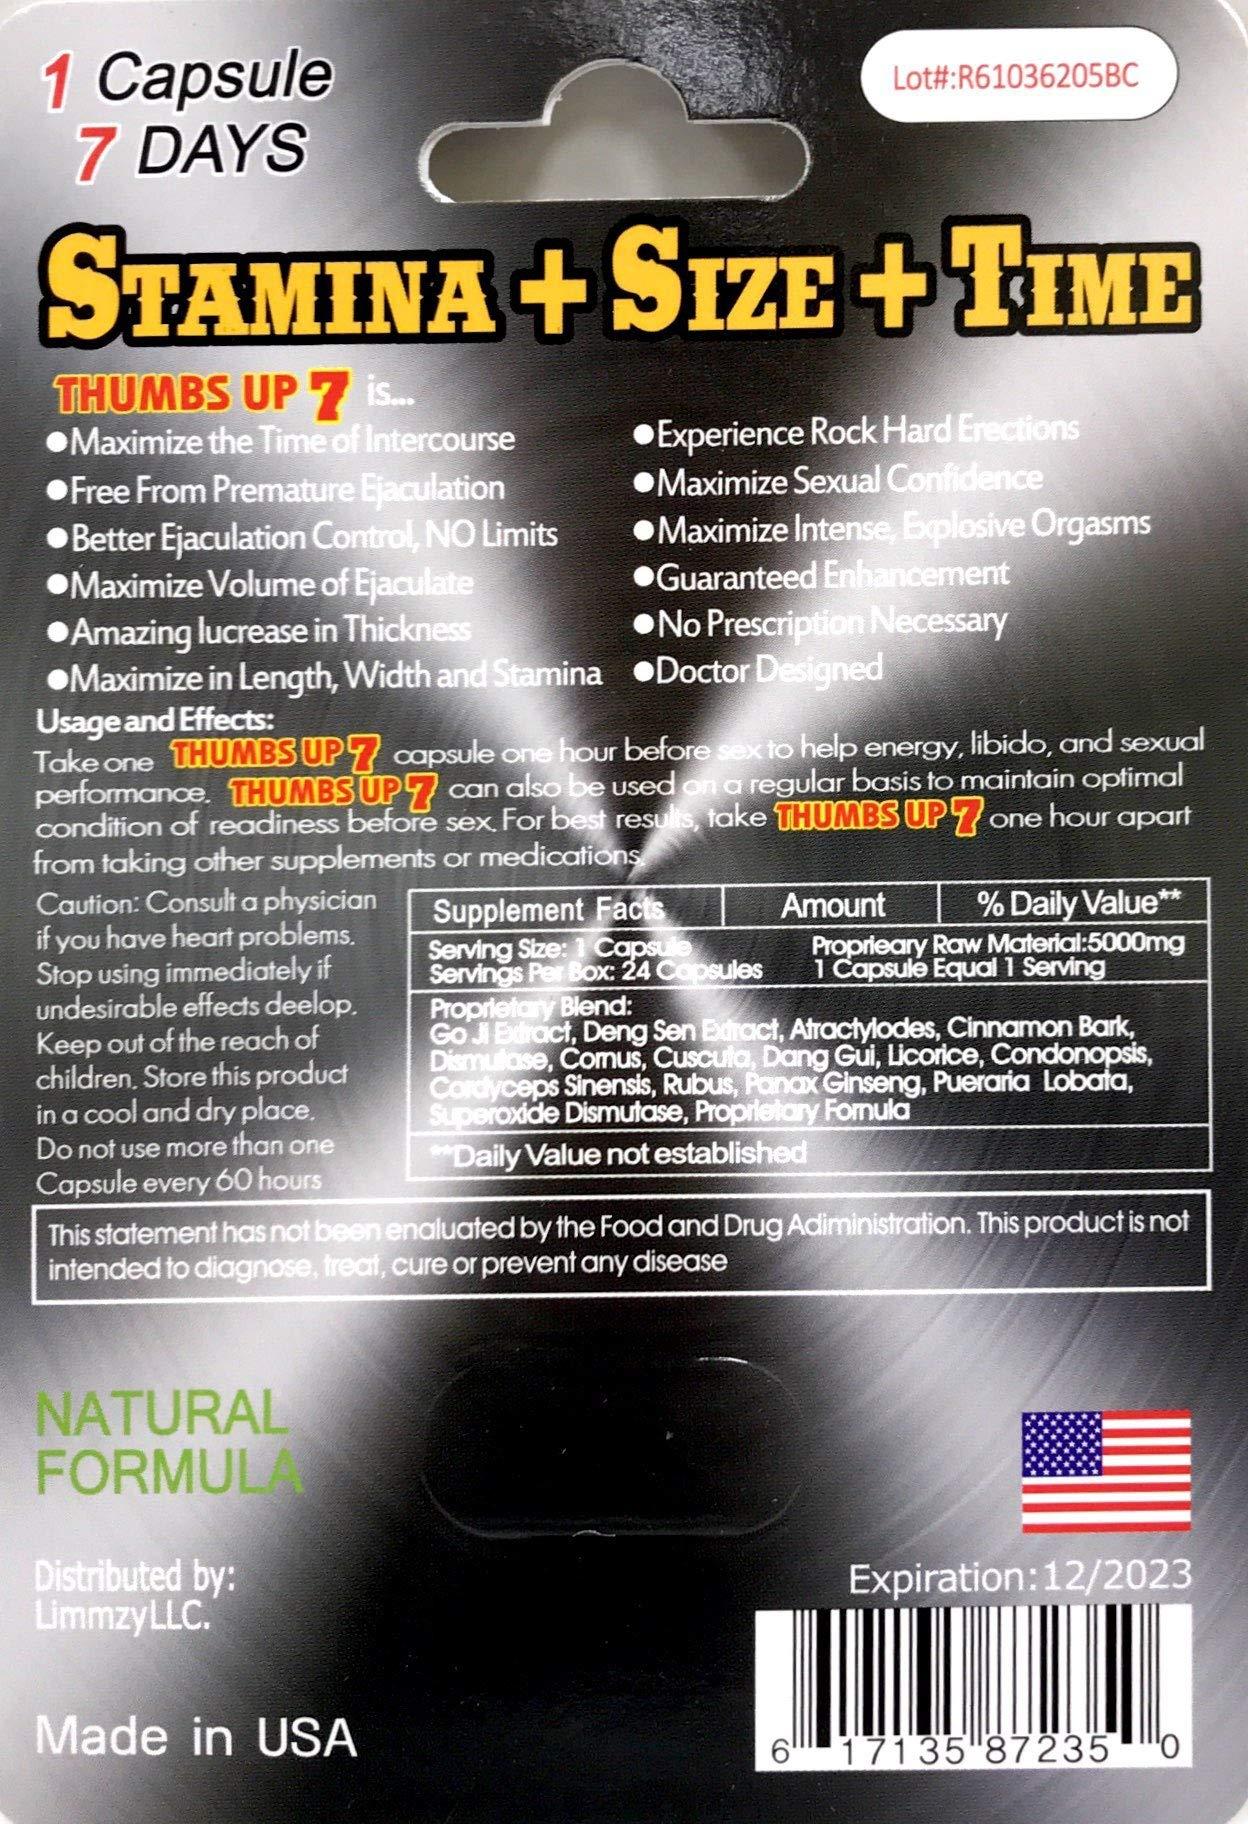 New Burro EN Primavera 30000 All Natural Male Enhancement Sex 5 Pills Thumbs Up 7 Red 70K 1 Pill by SUM MARKETING LLC